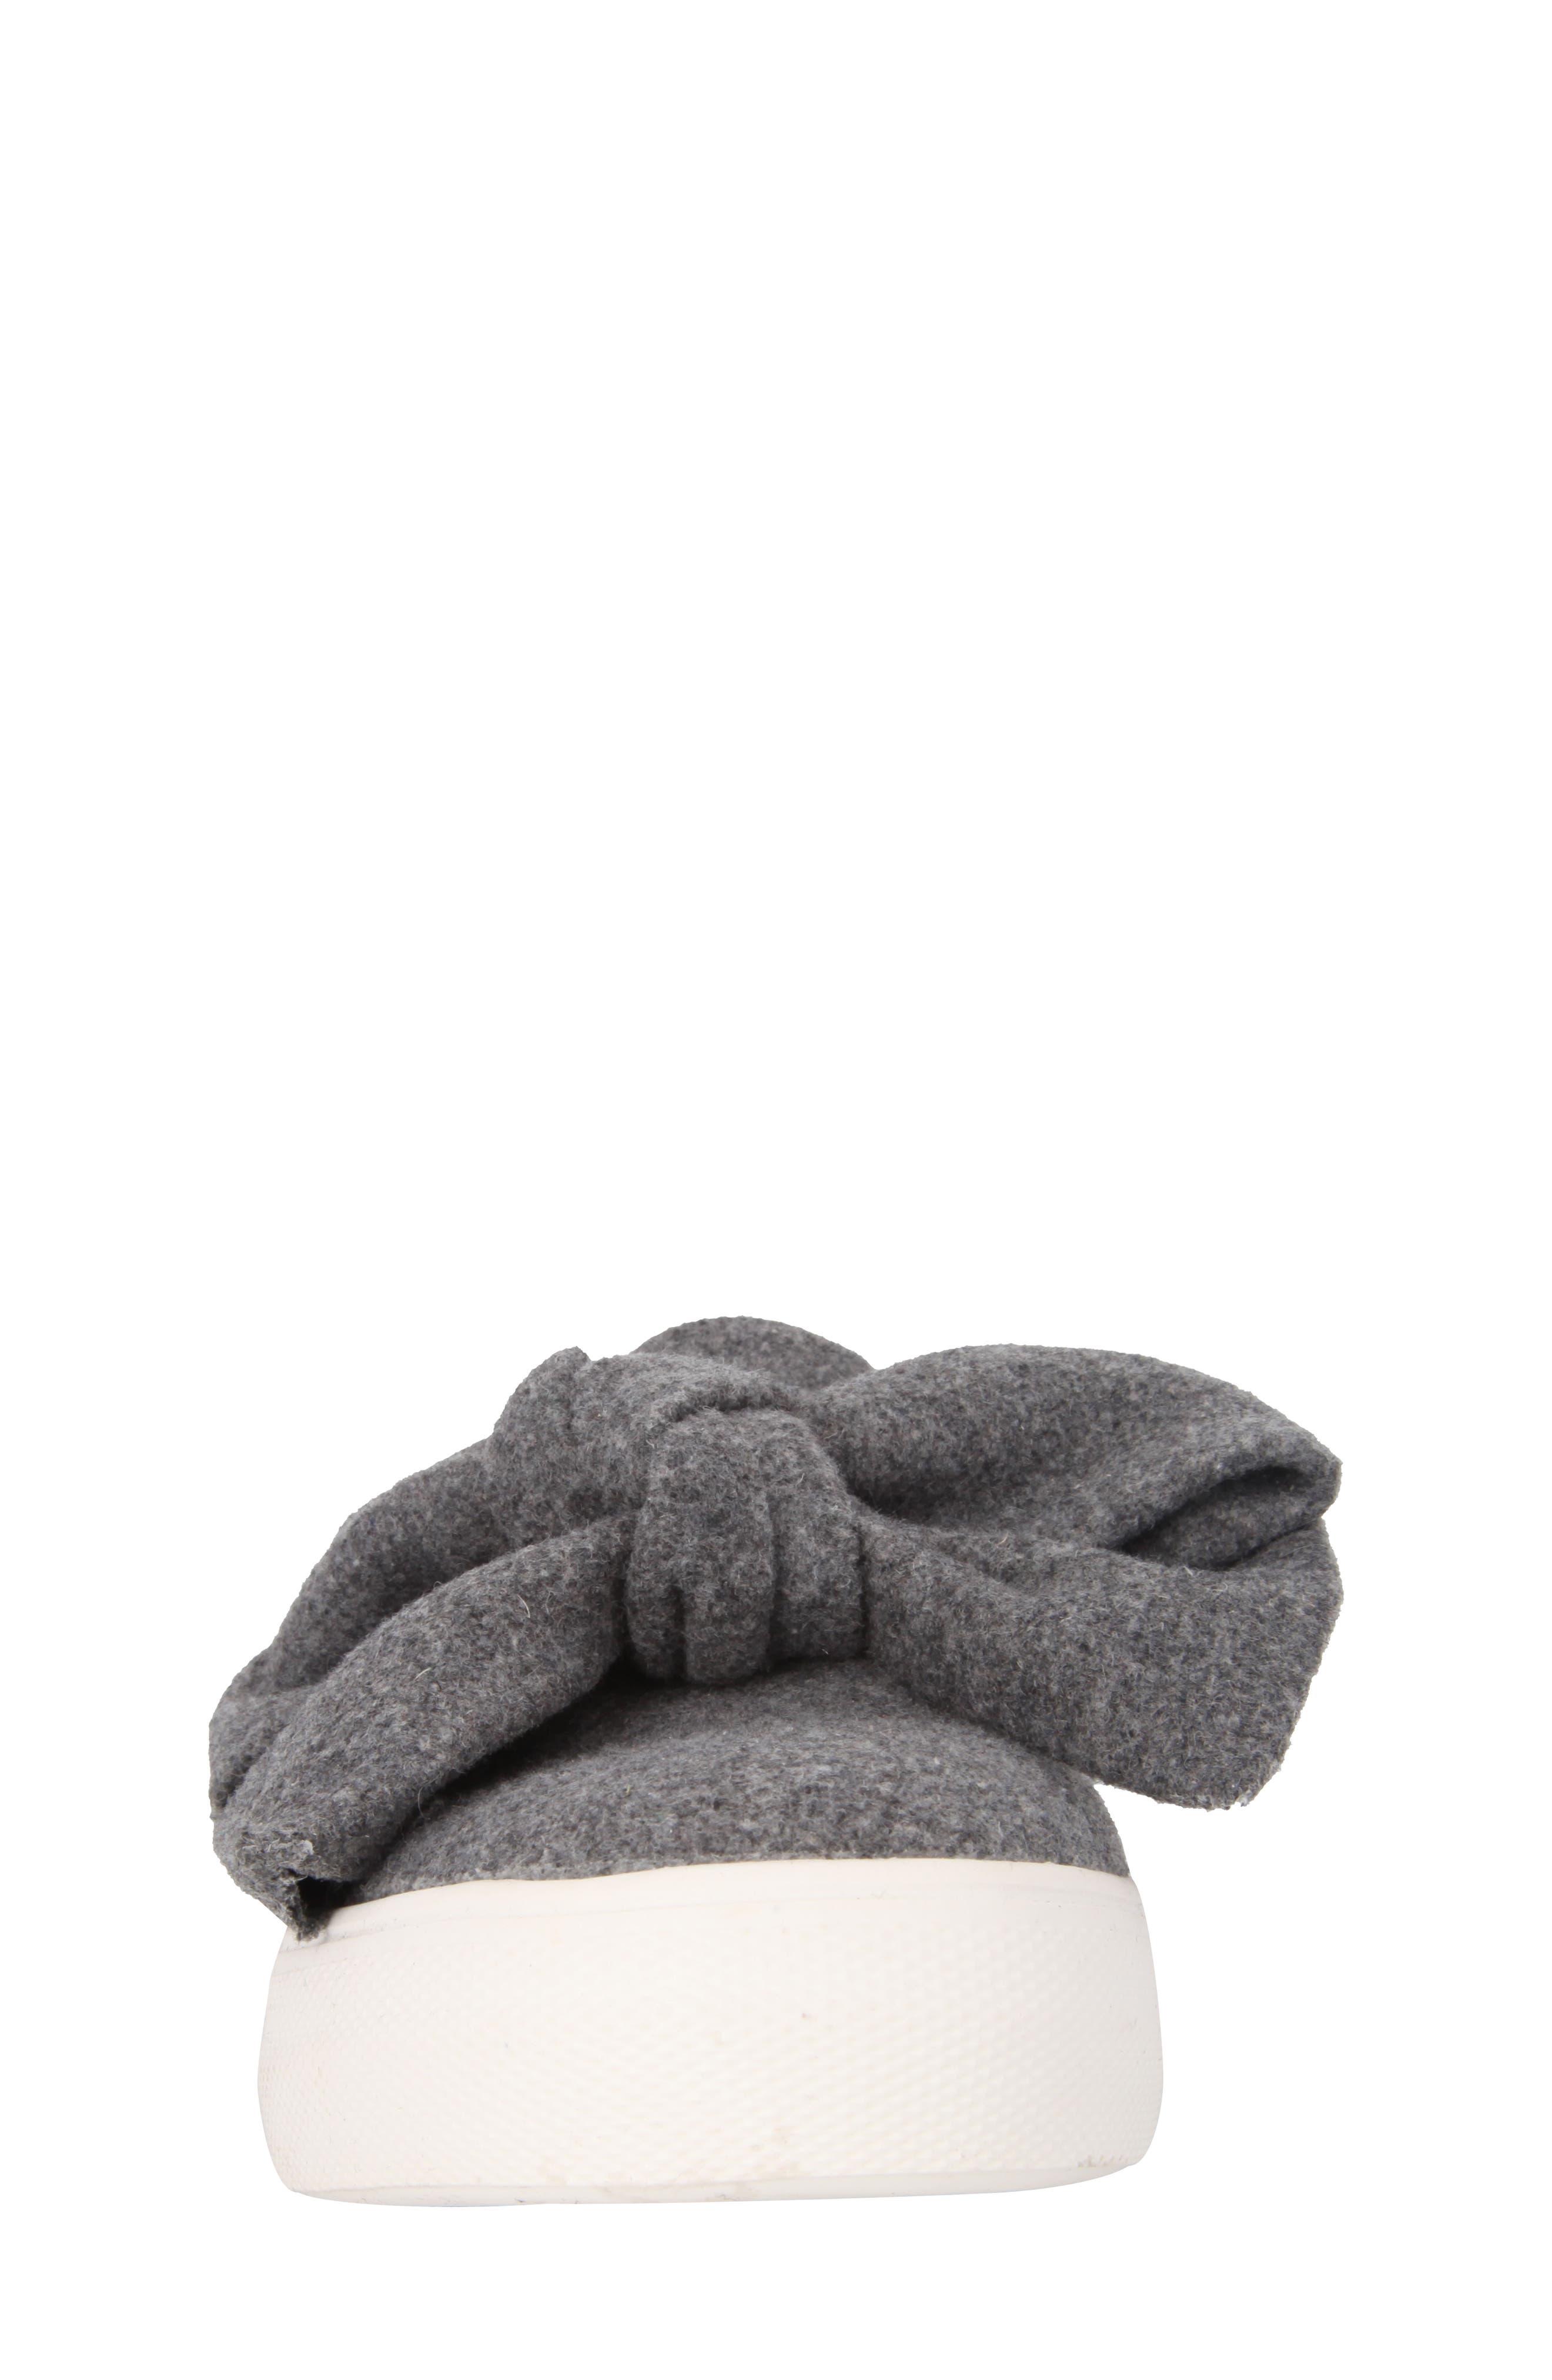 Vaneza Slip-On Bow Sneaker,                             Alternate thumbnail 4, color,                             Grey Flannel